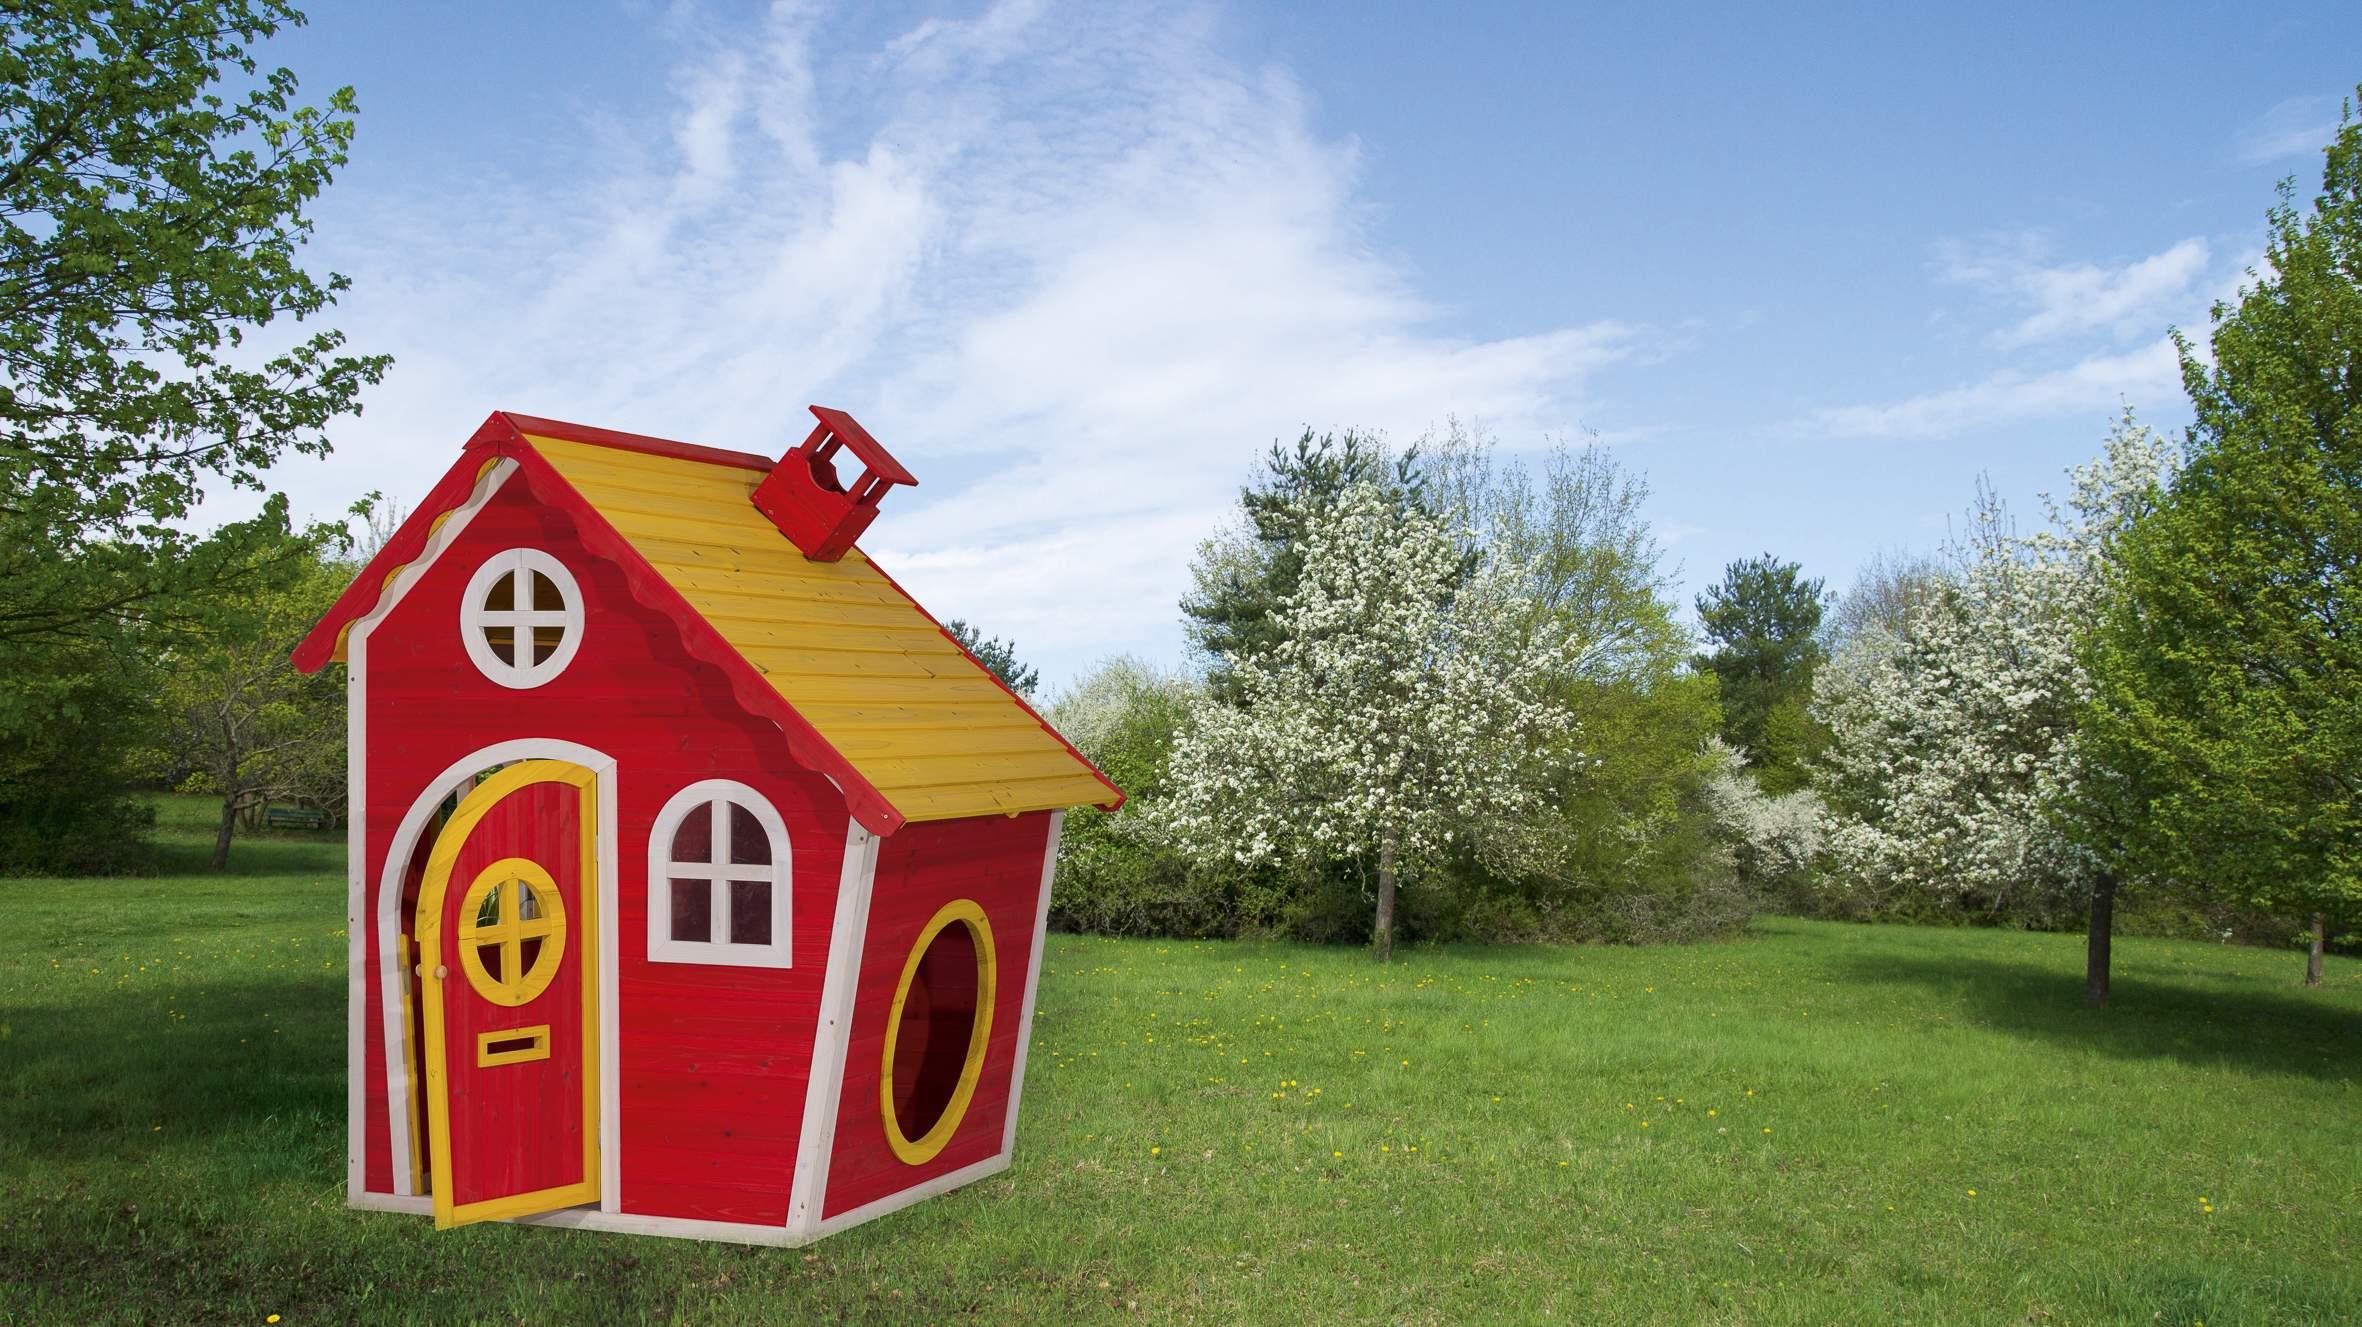 Kinderspielhaus Mia mit Blumenkasten CS58 2019 1